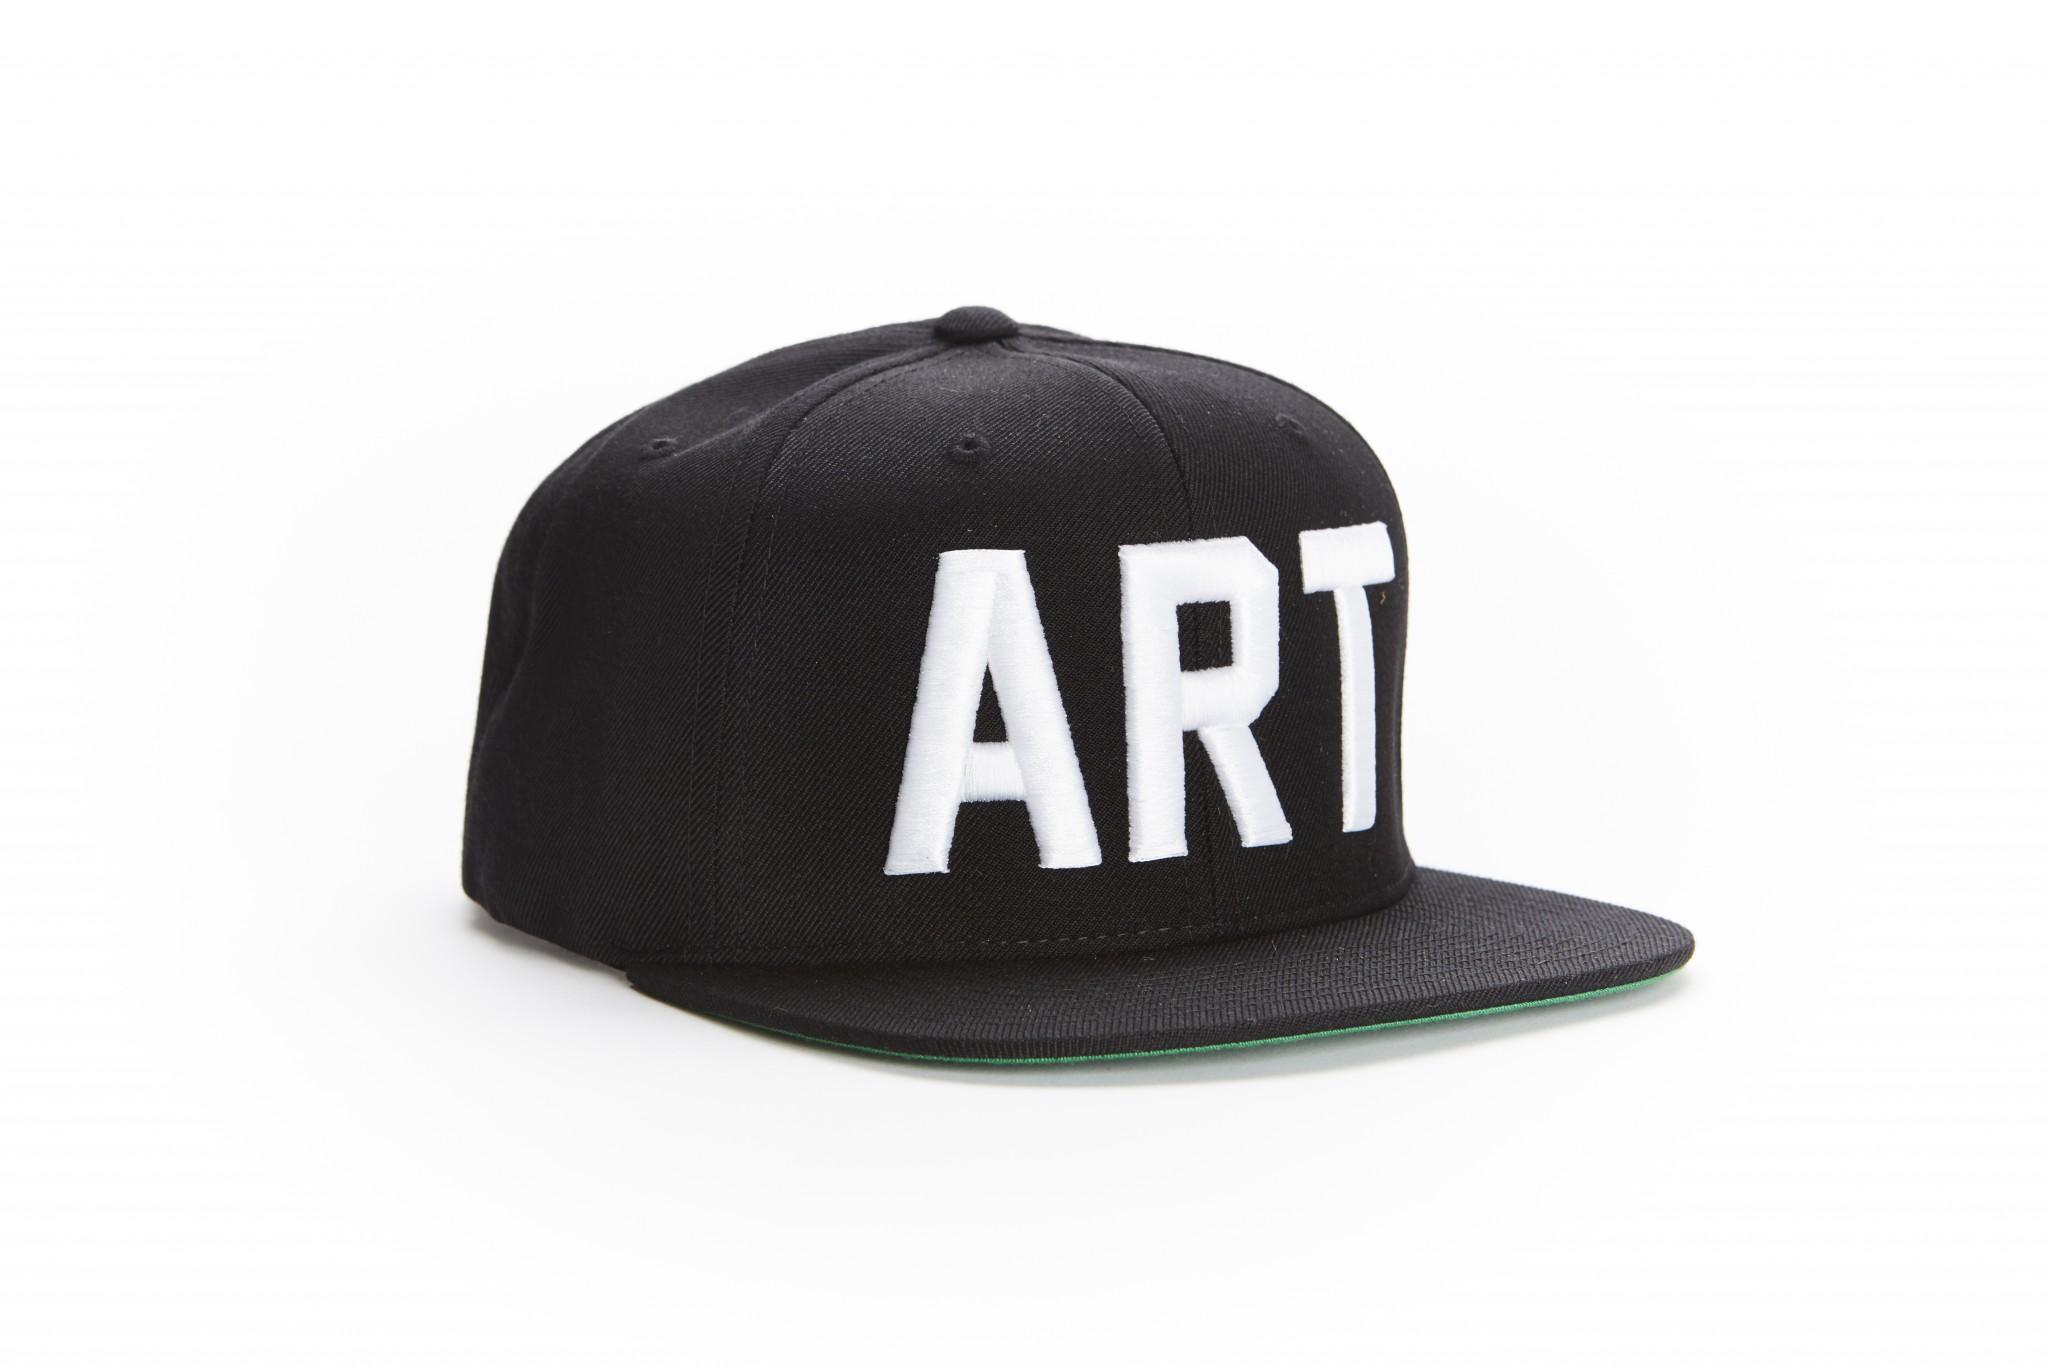 709c7386 Snapback Hat - Black/White